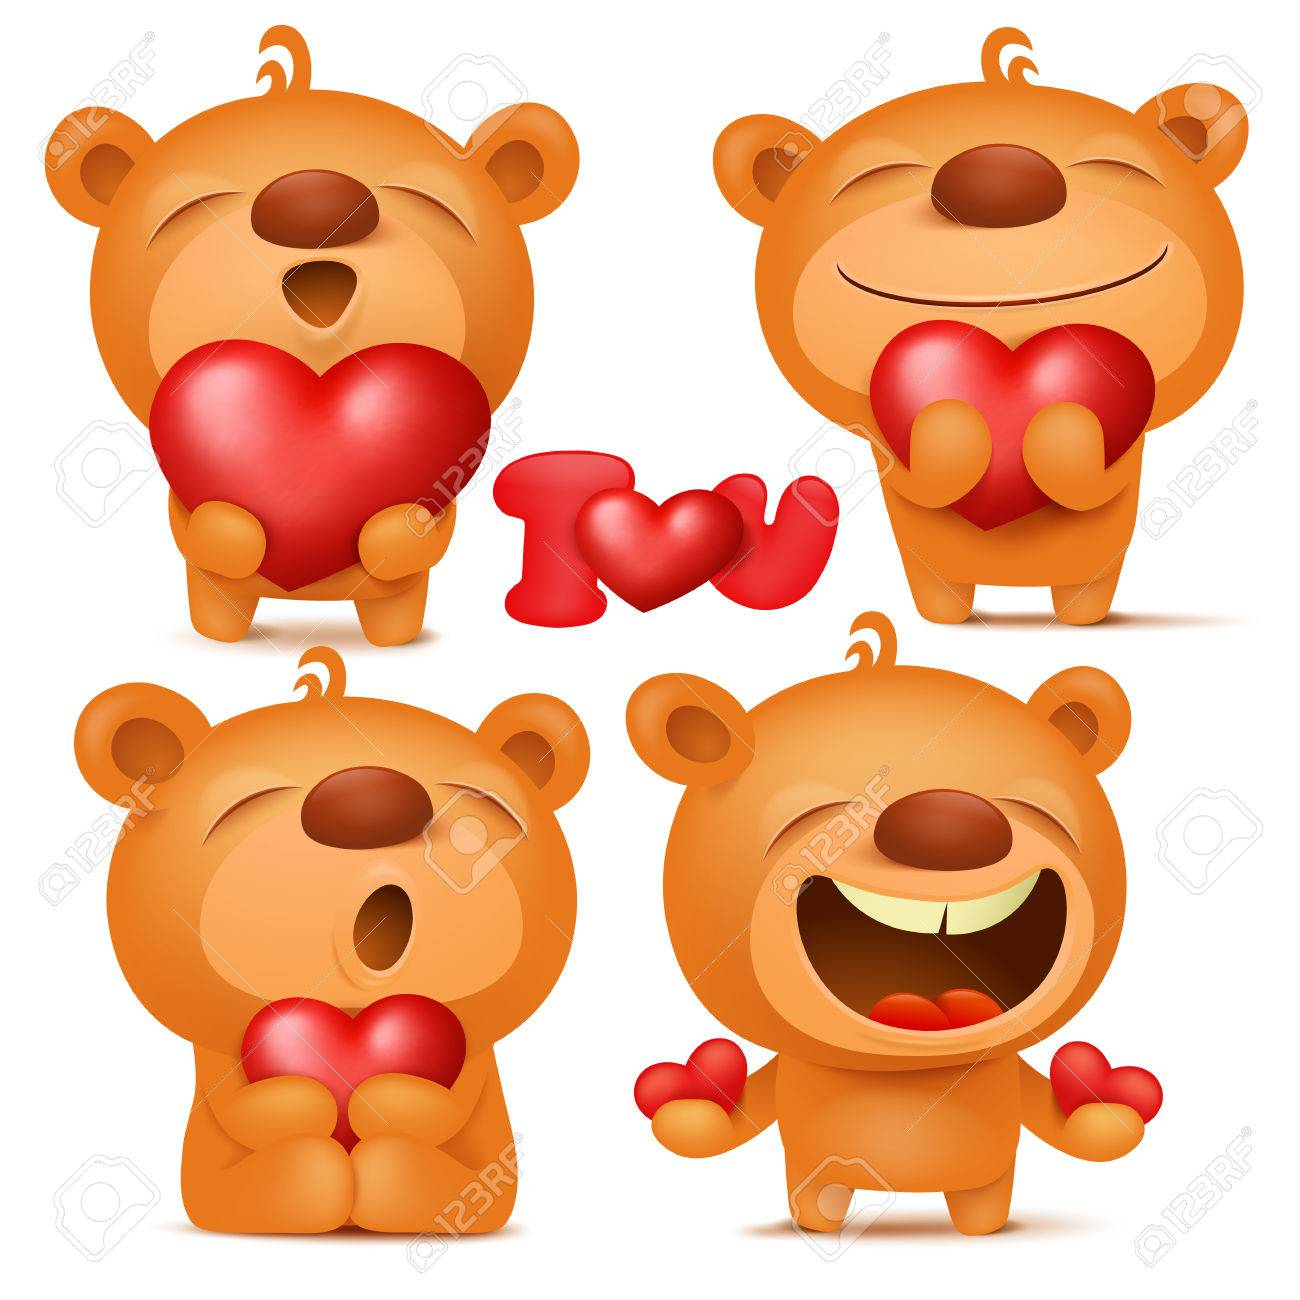 valentine teddy bear emoji cartoon characters set with hearts